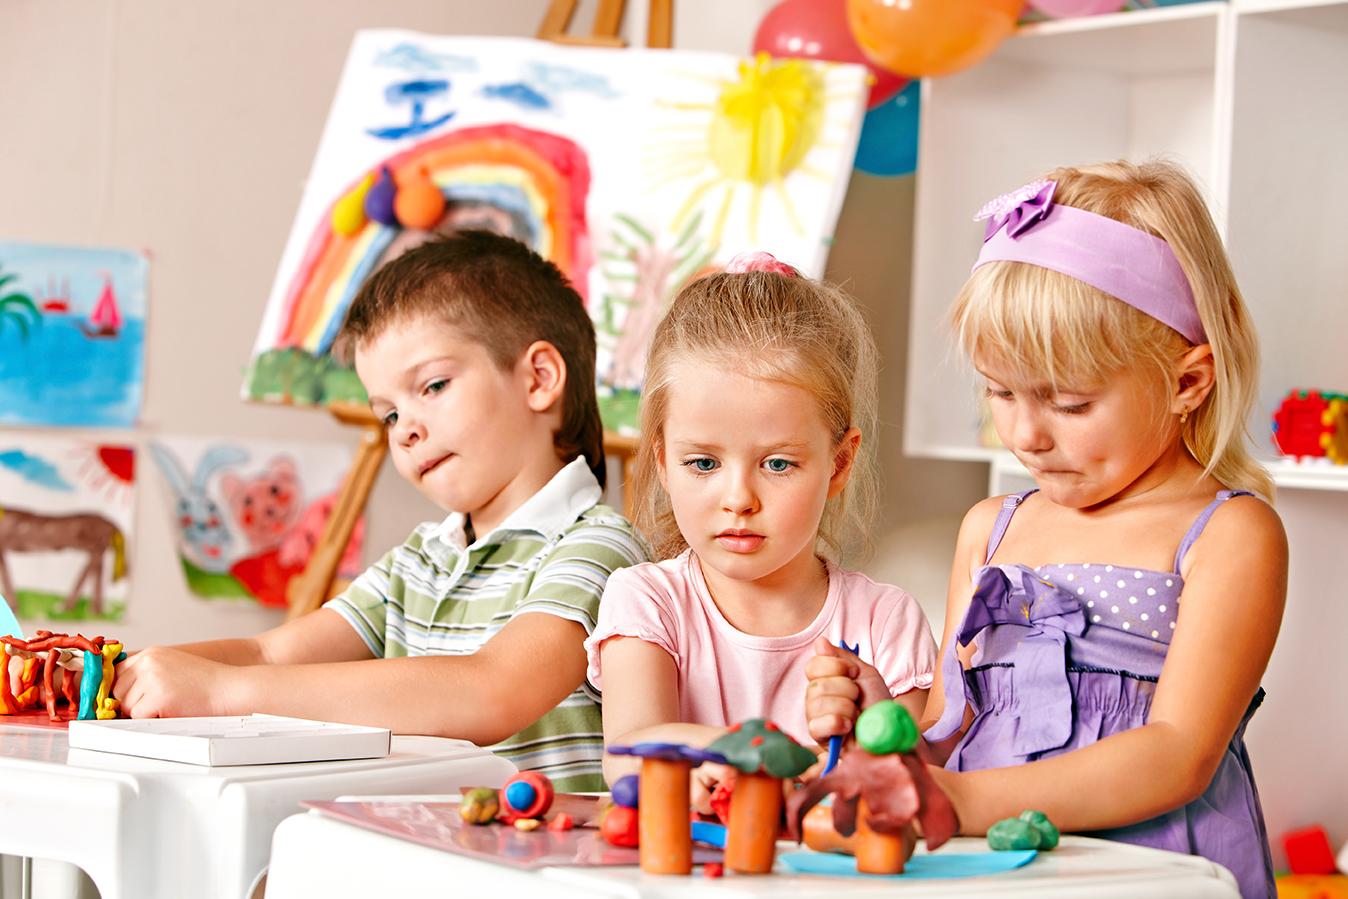 Perkembangan Anak Usia Dini Mitra Riset Http Www Mitrariset Pengelolaan